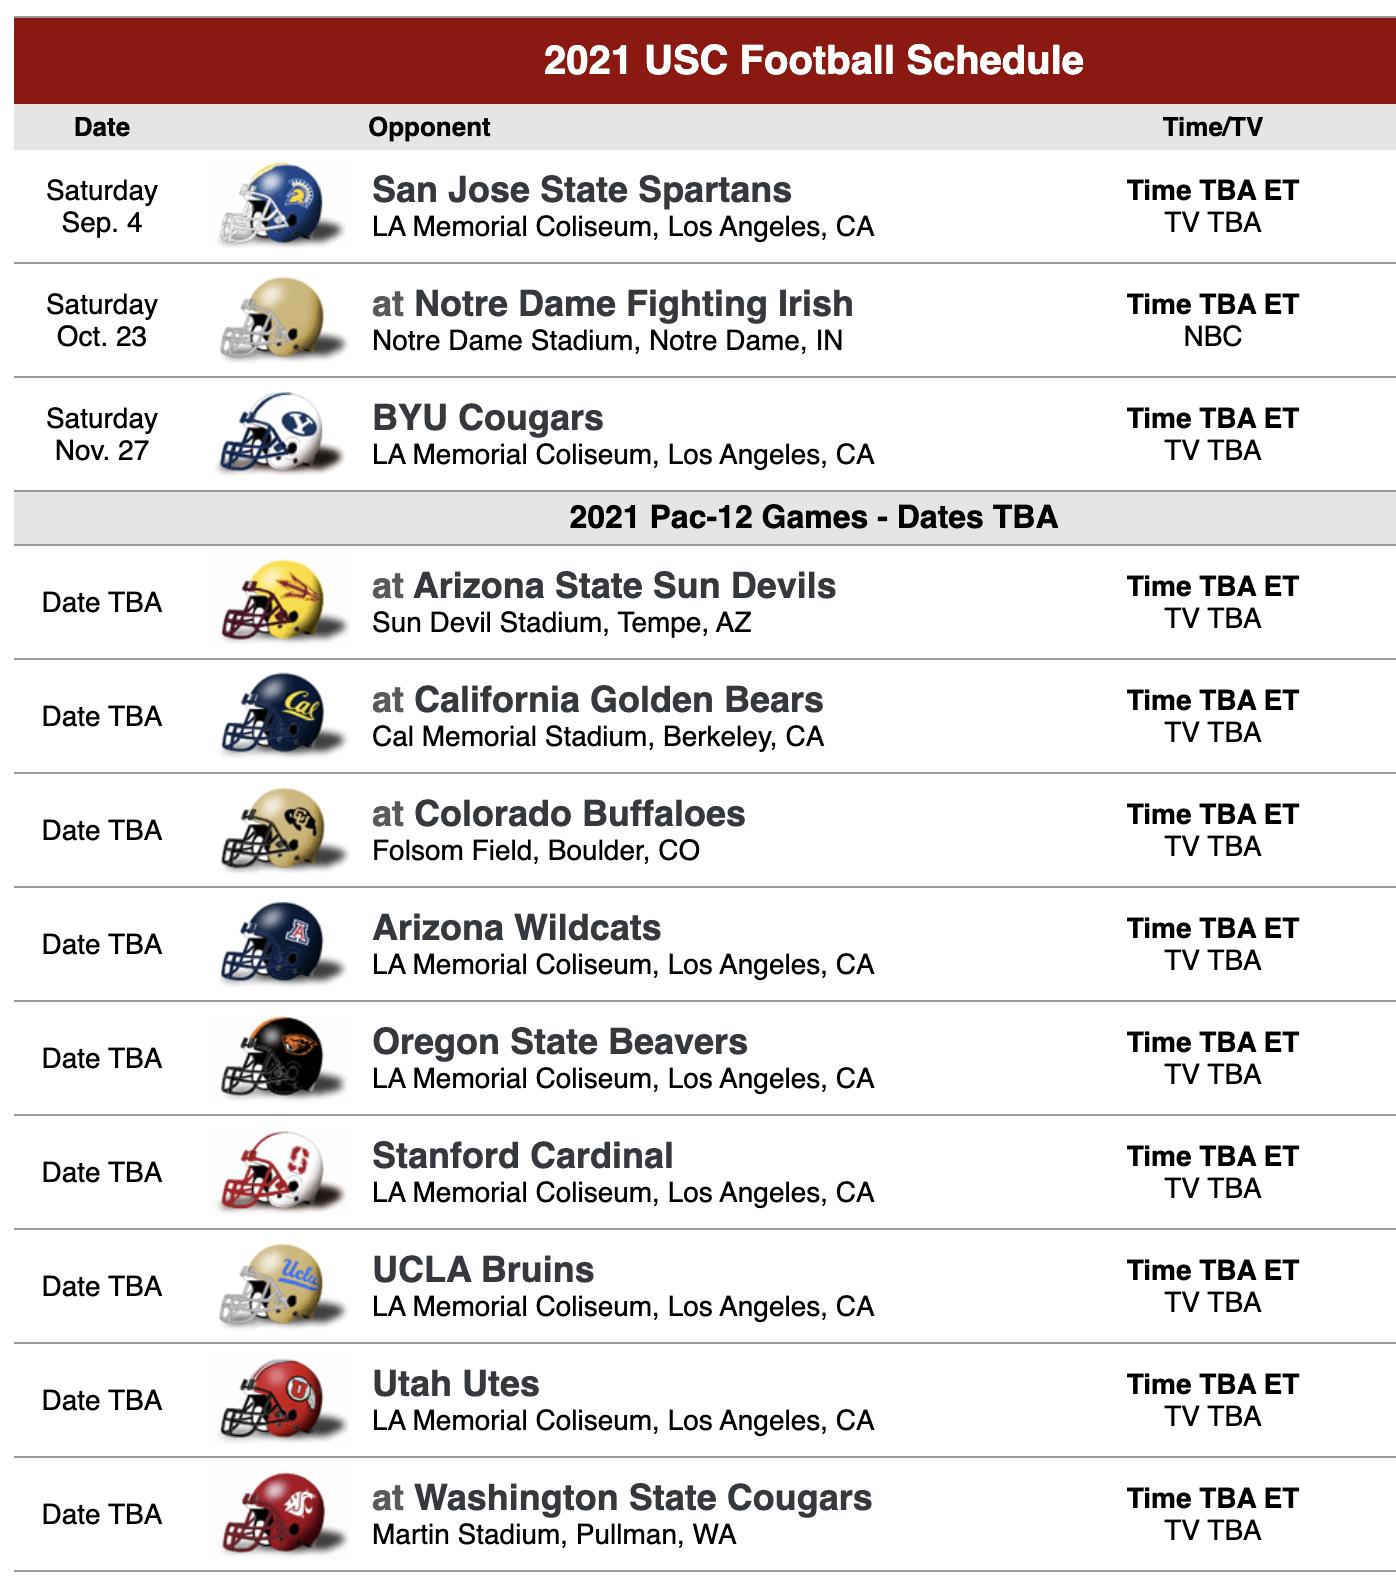 USC 2021 Football Schedule